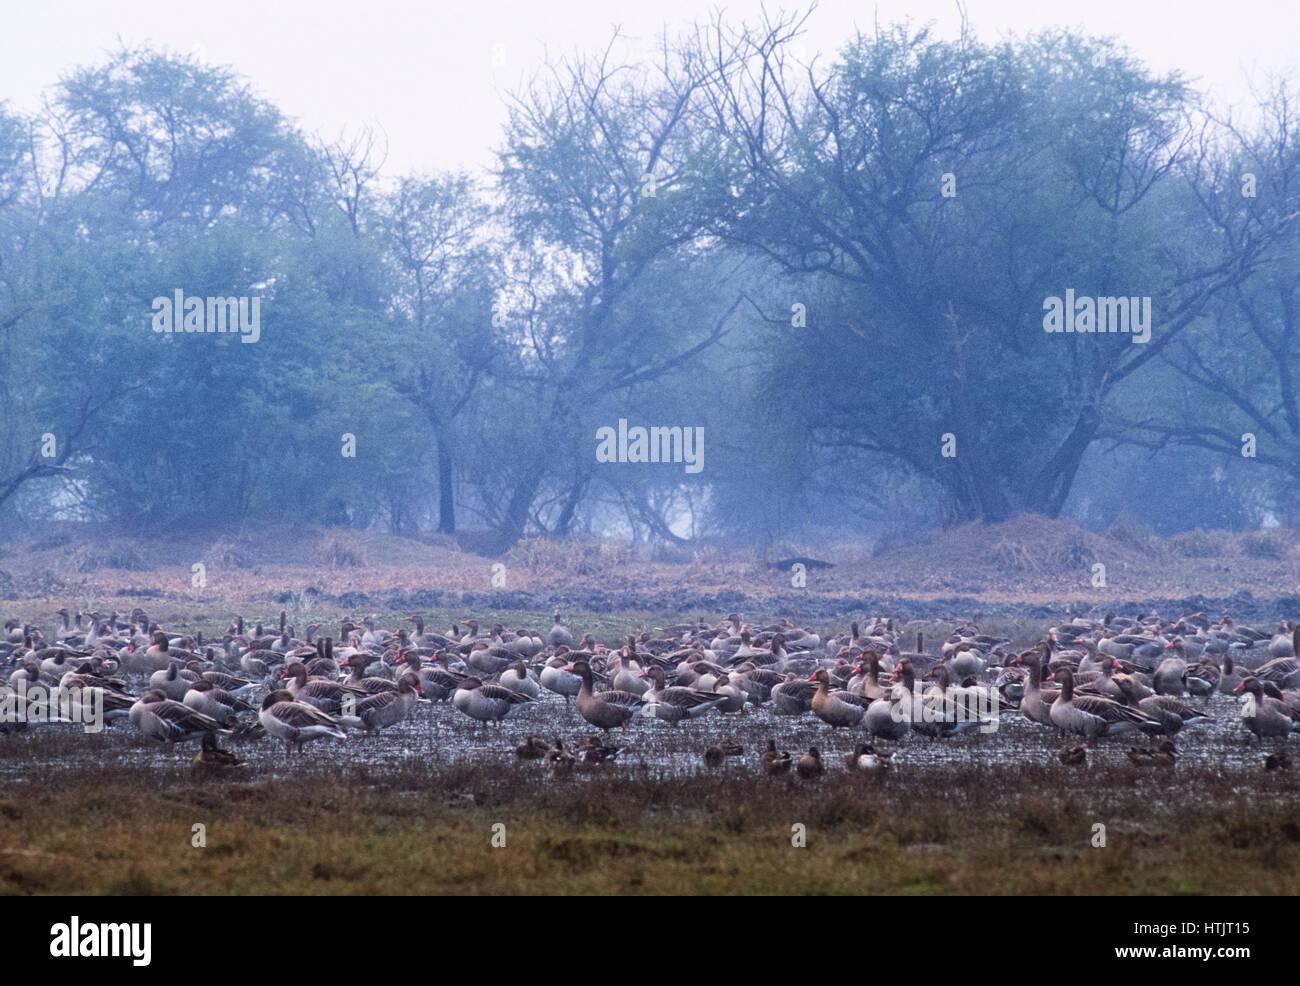 Greylag Geese, (Anser anser) on wetland, Keoladeo Ghana National Park, Bharatpur, Rajsthan, India - Stock Image